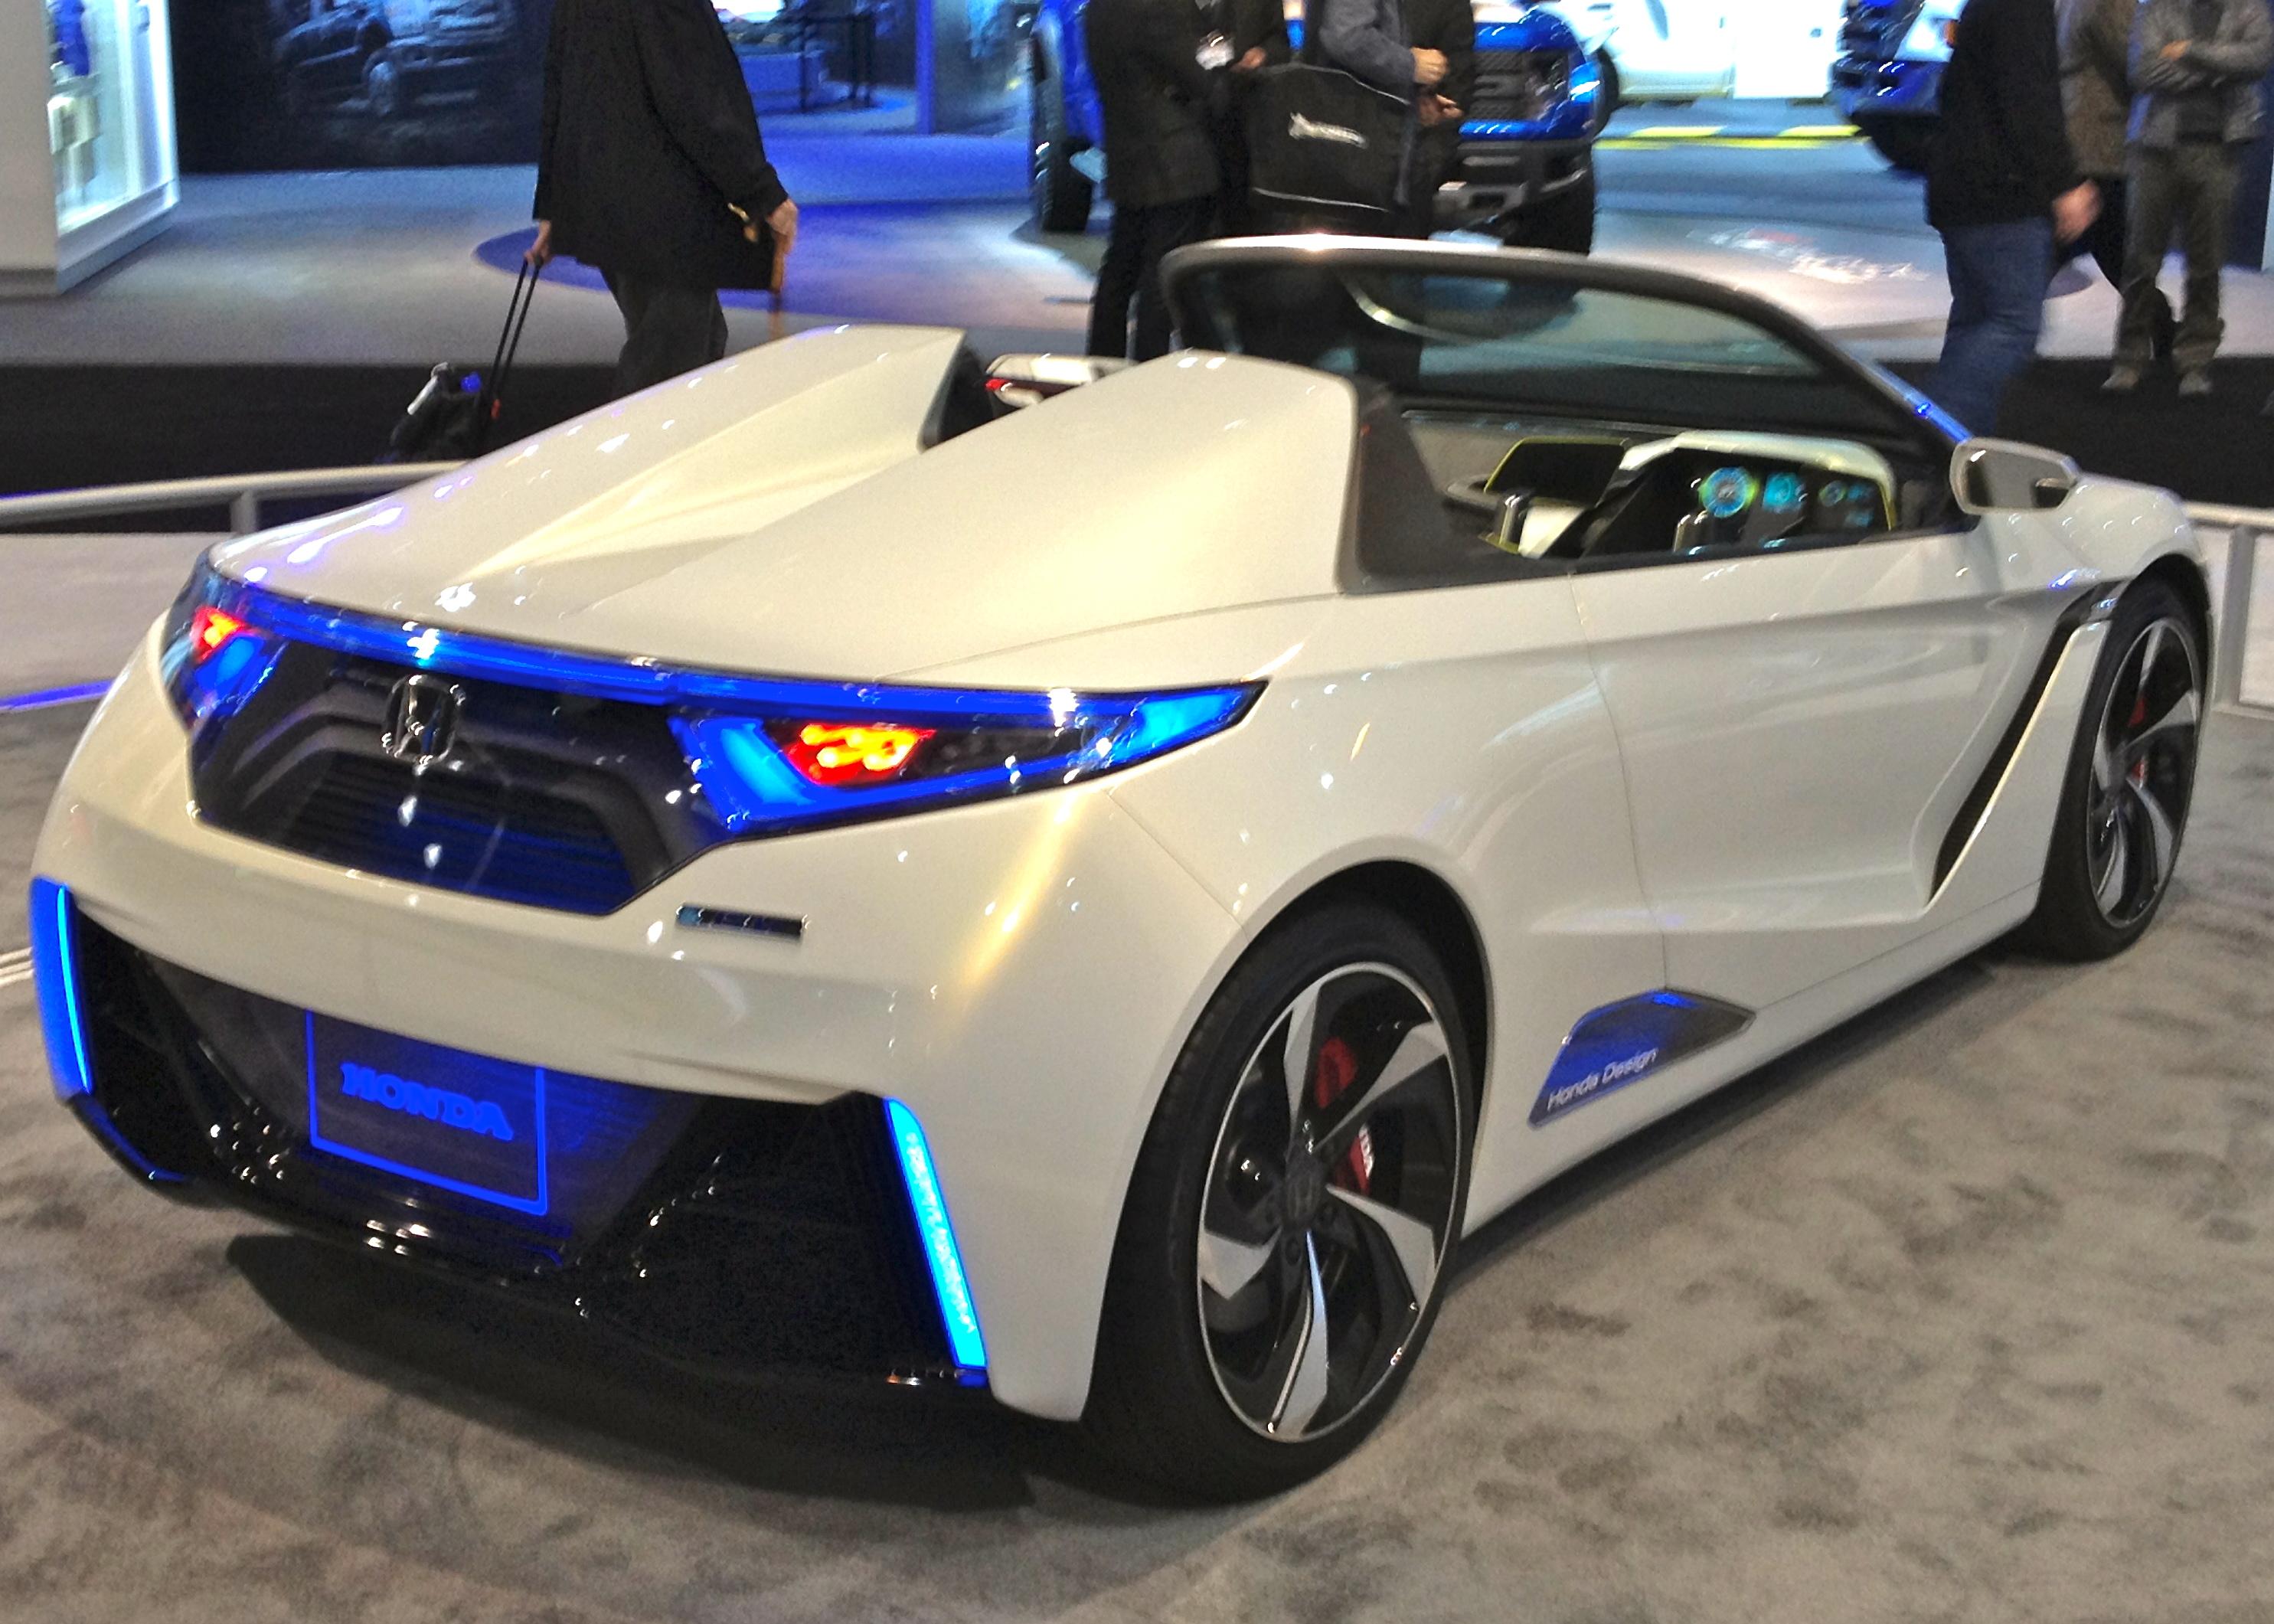 Lexus 2 Seater Sports Car | Top Car Release 2019 2020